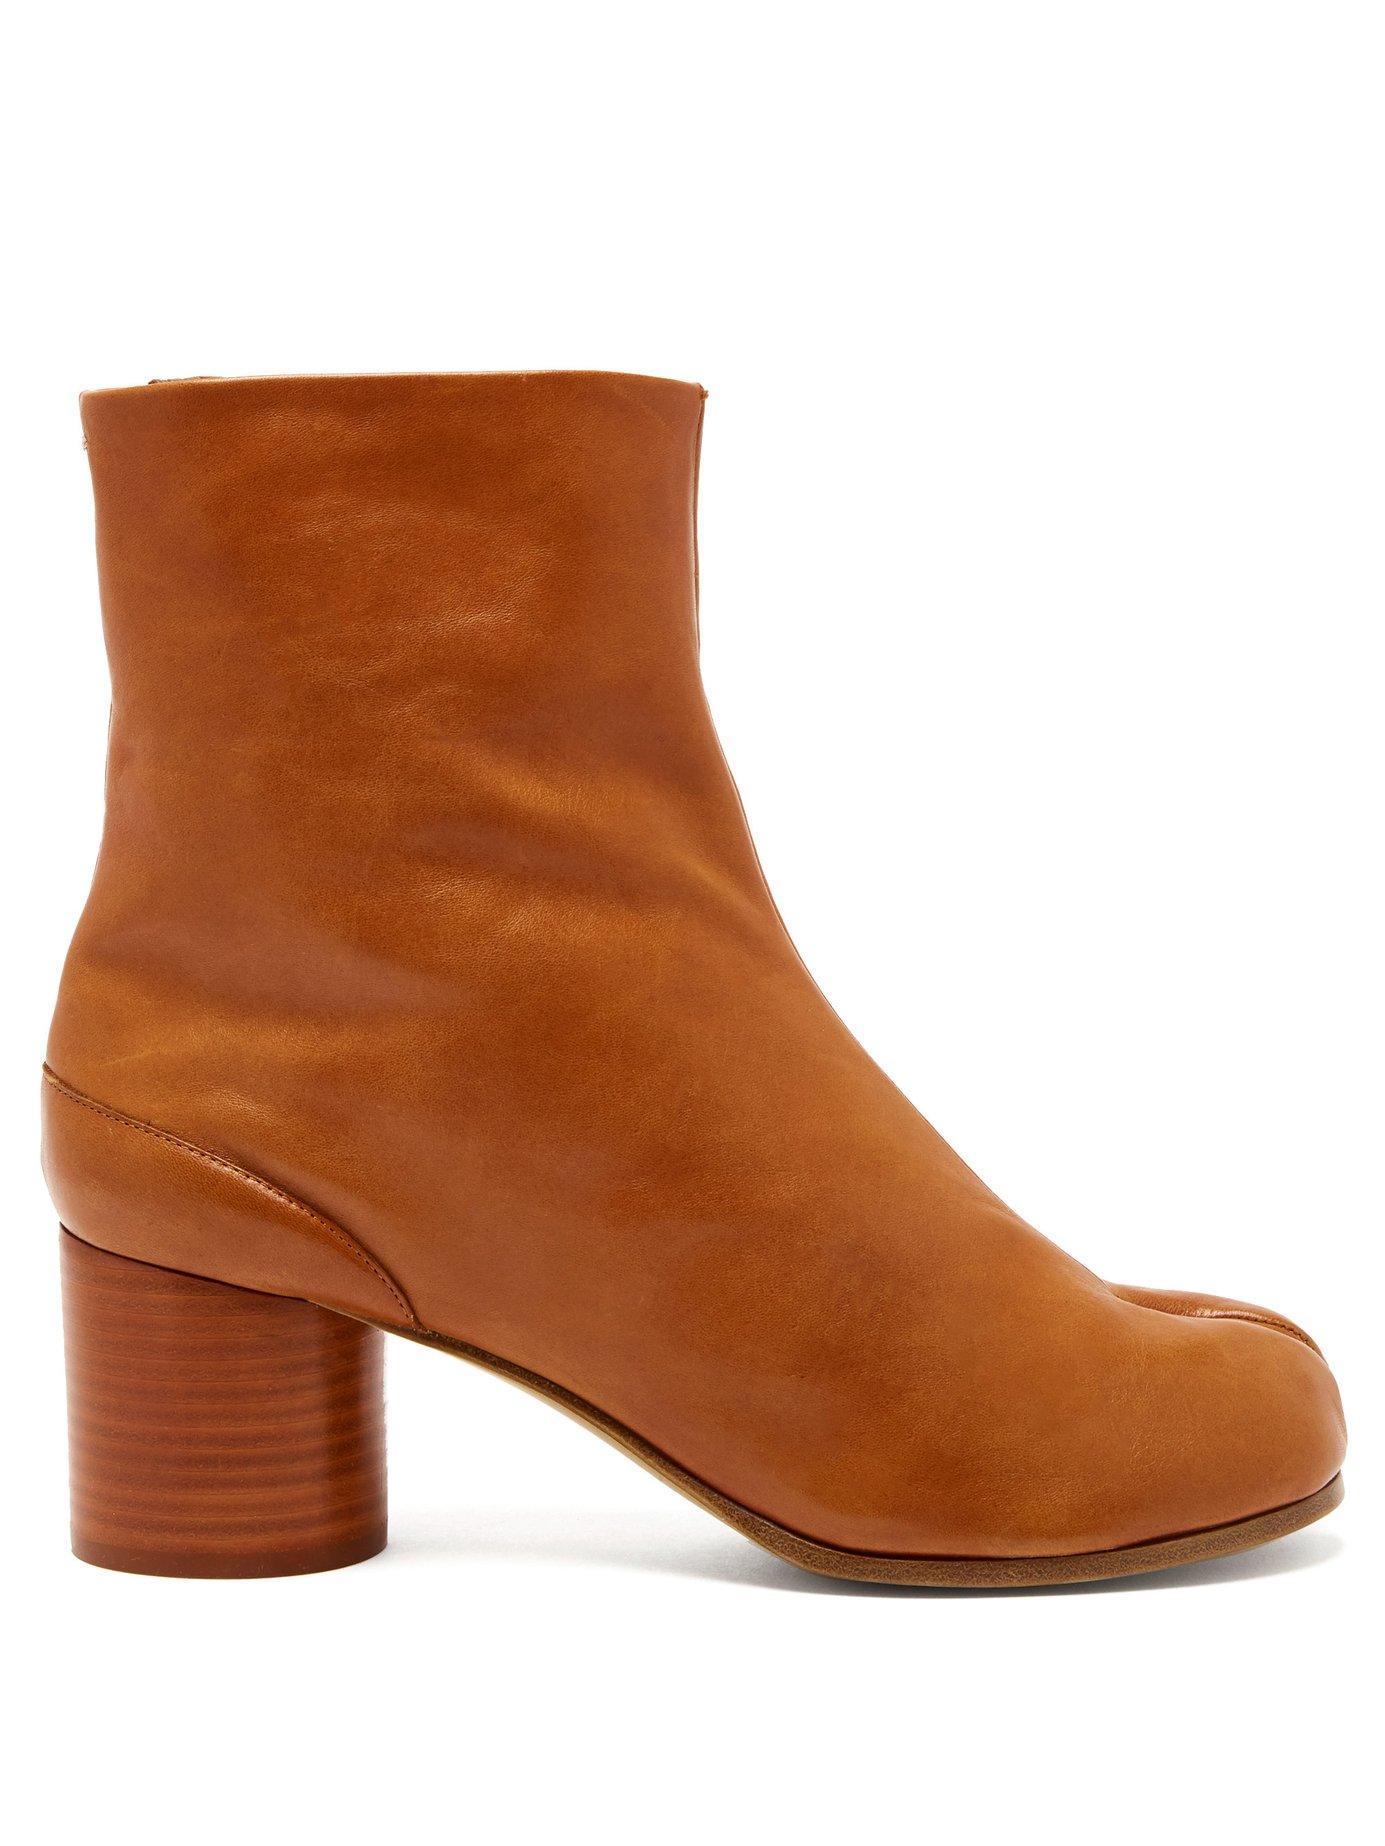 9447374250d Lyst - Maison Margiela Tabi Split Toe Leather Ankle Boots in Brown